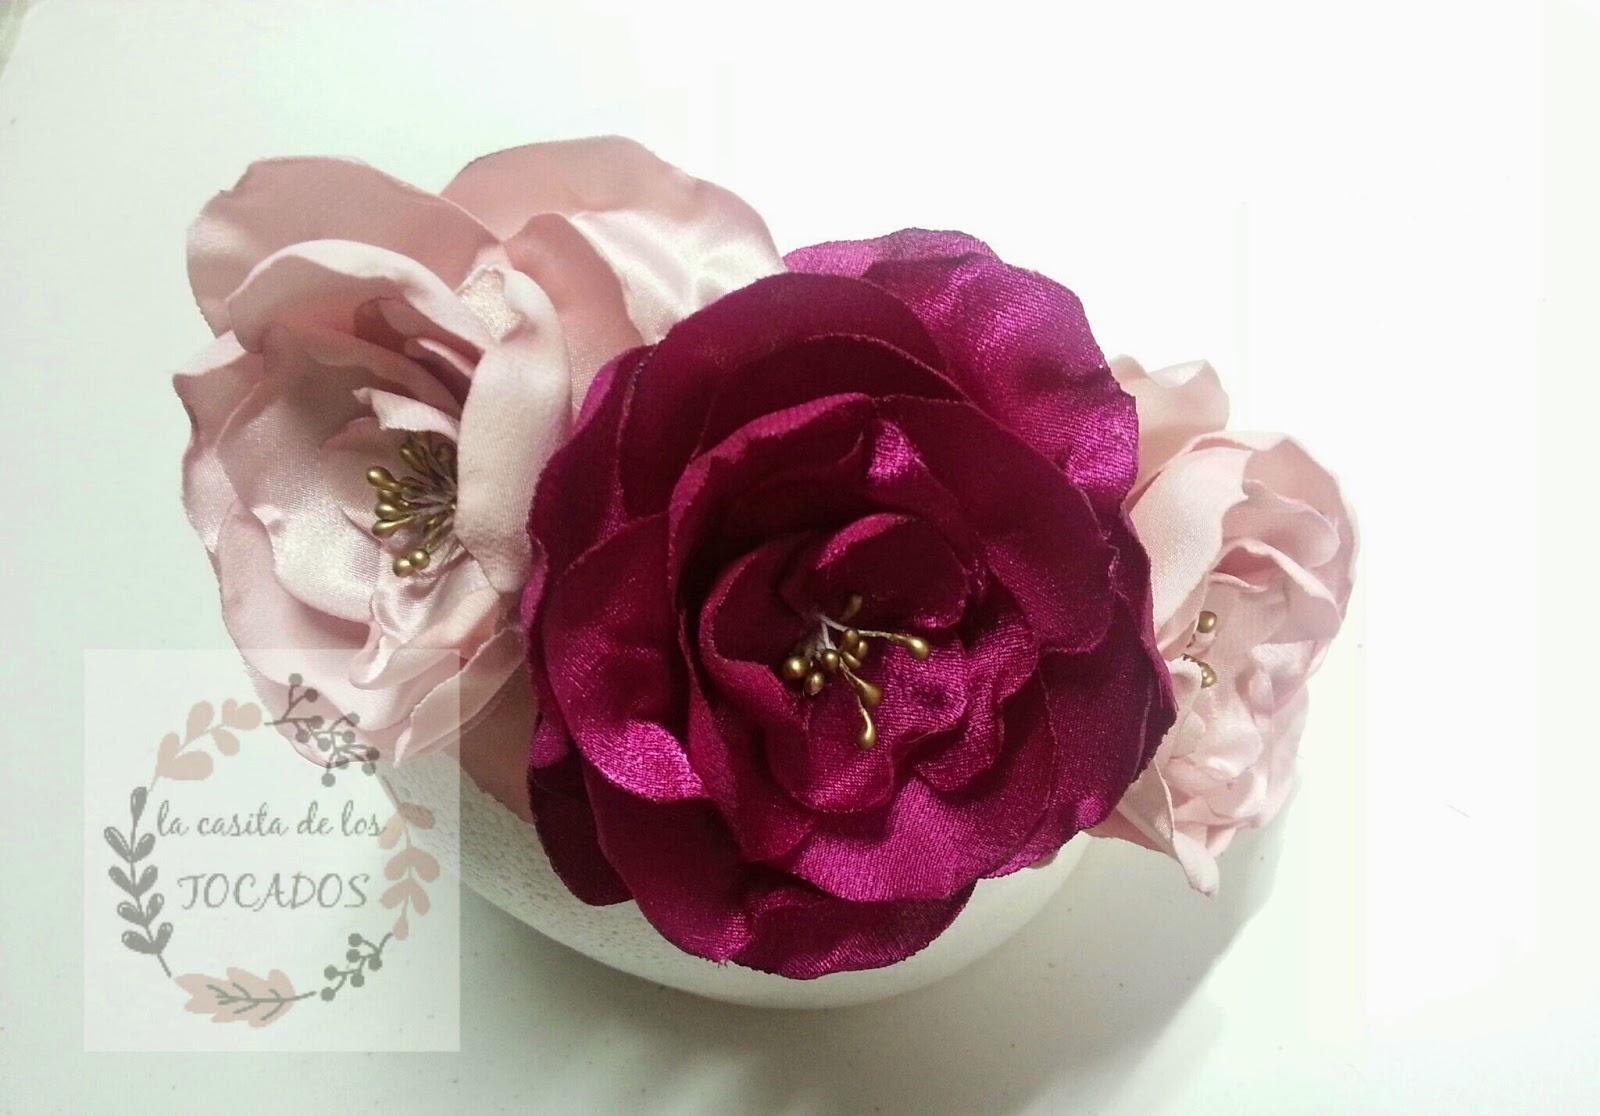 diadema de flores artesanales para boda o evento de fiesta a buen precio